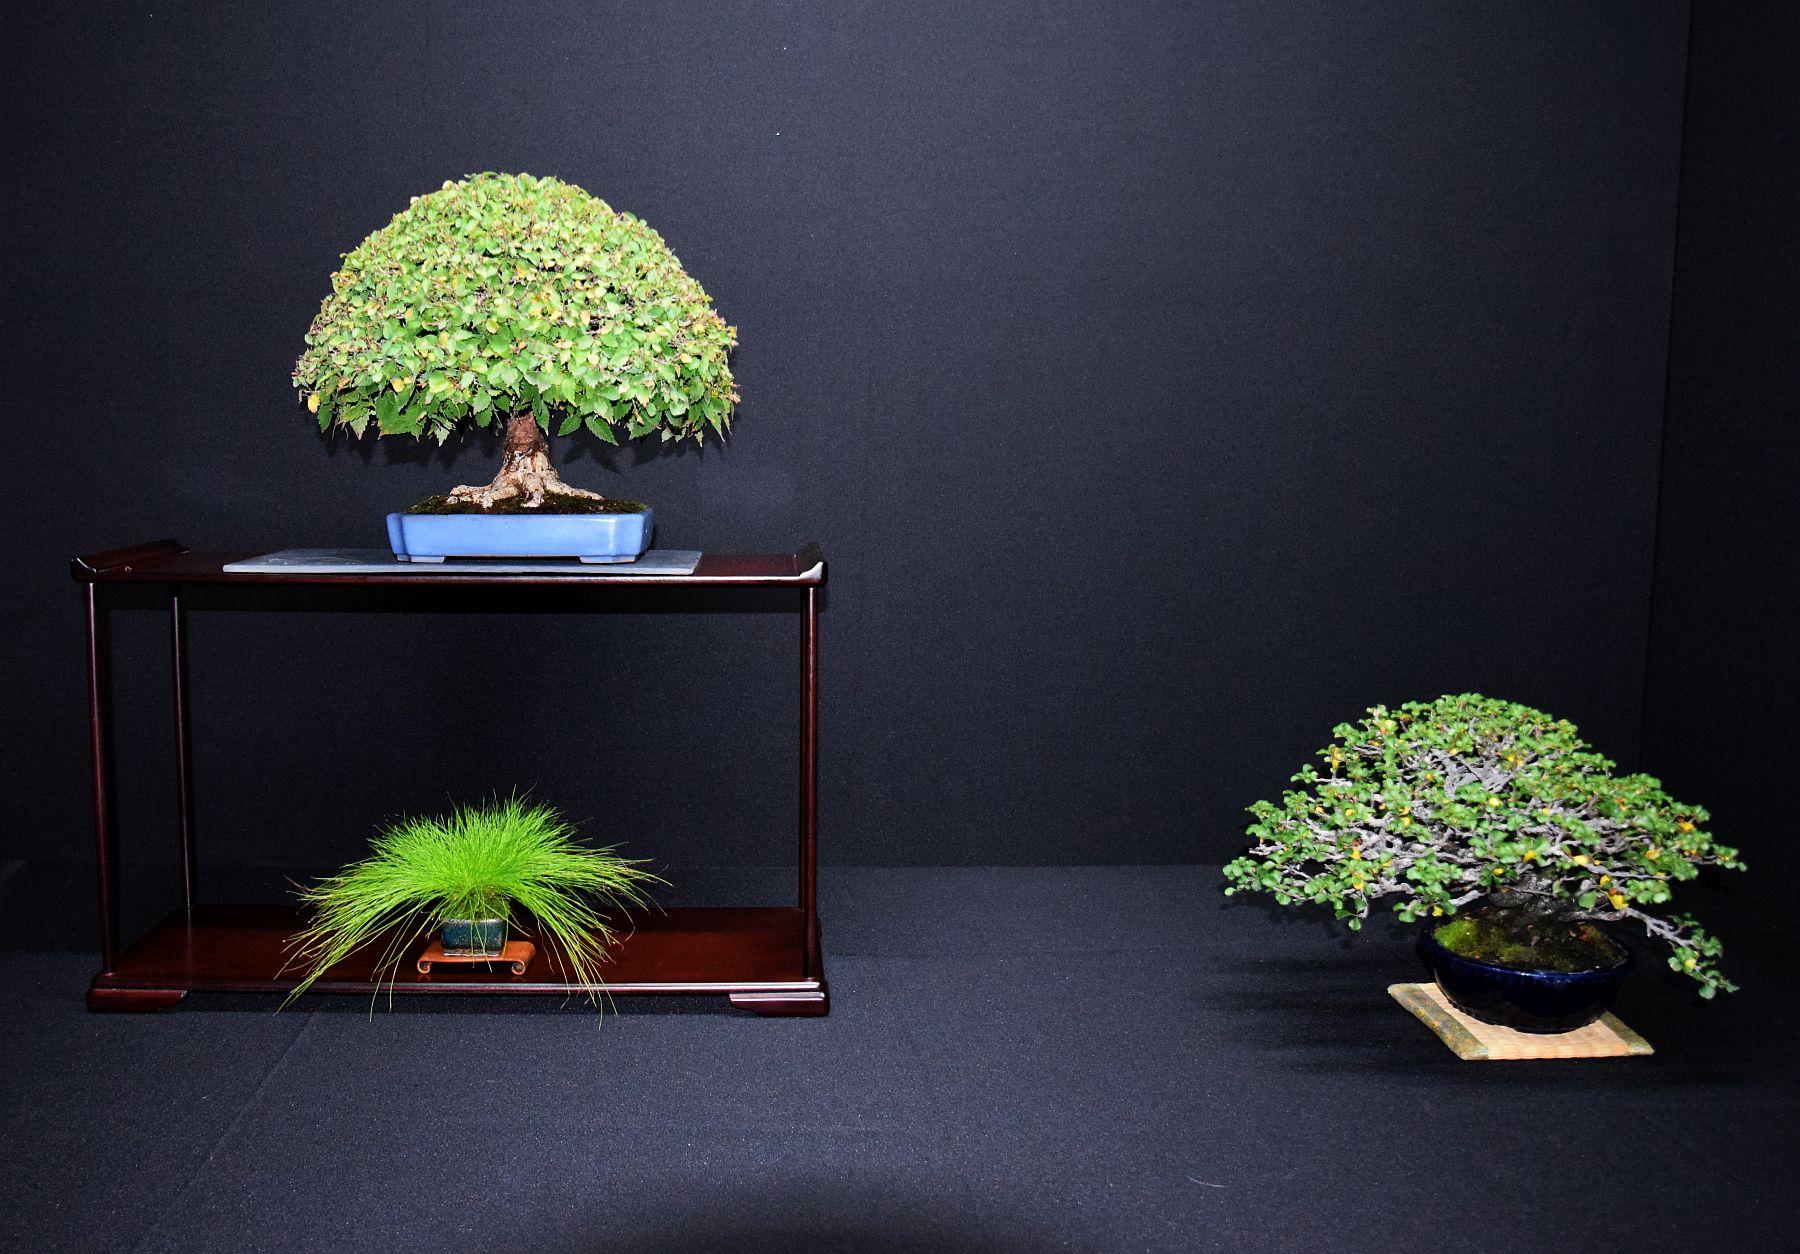 bonsai-museum-luis-vallejo-012